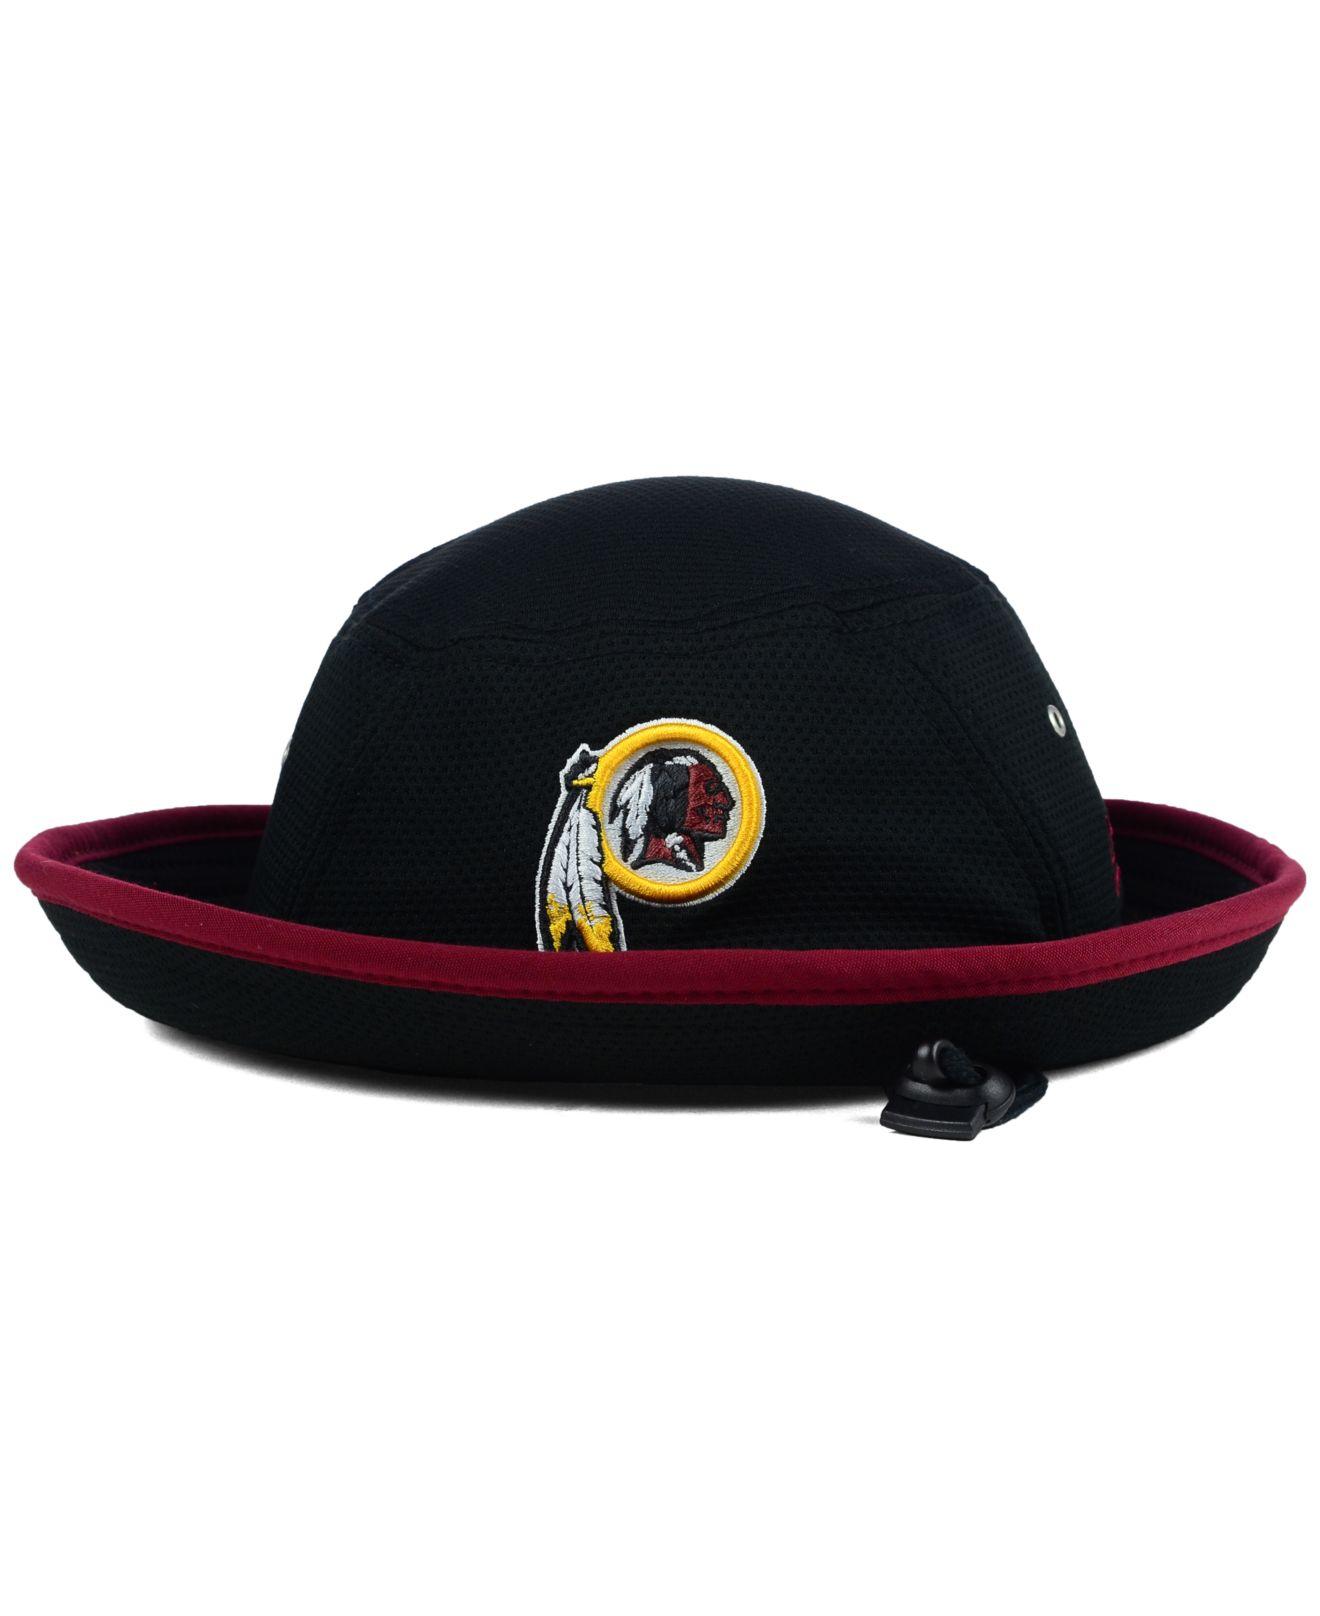 Men s Washington Redskins New Era White Solid Cuffed Knit Hat 5b1d47cd6